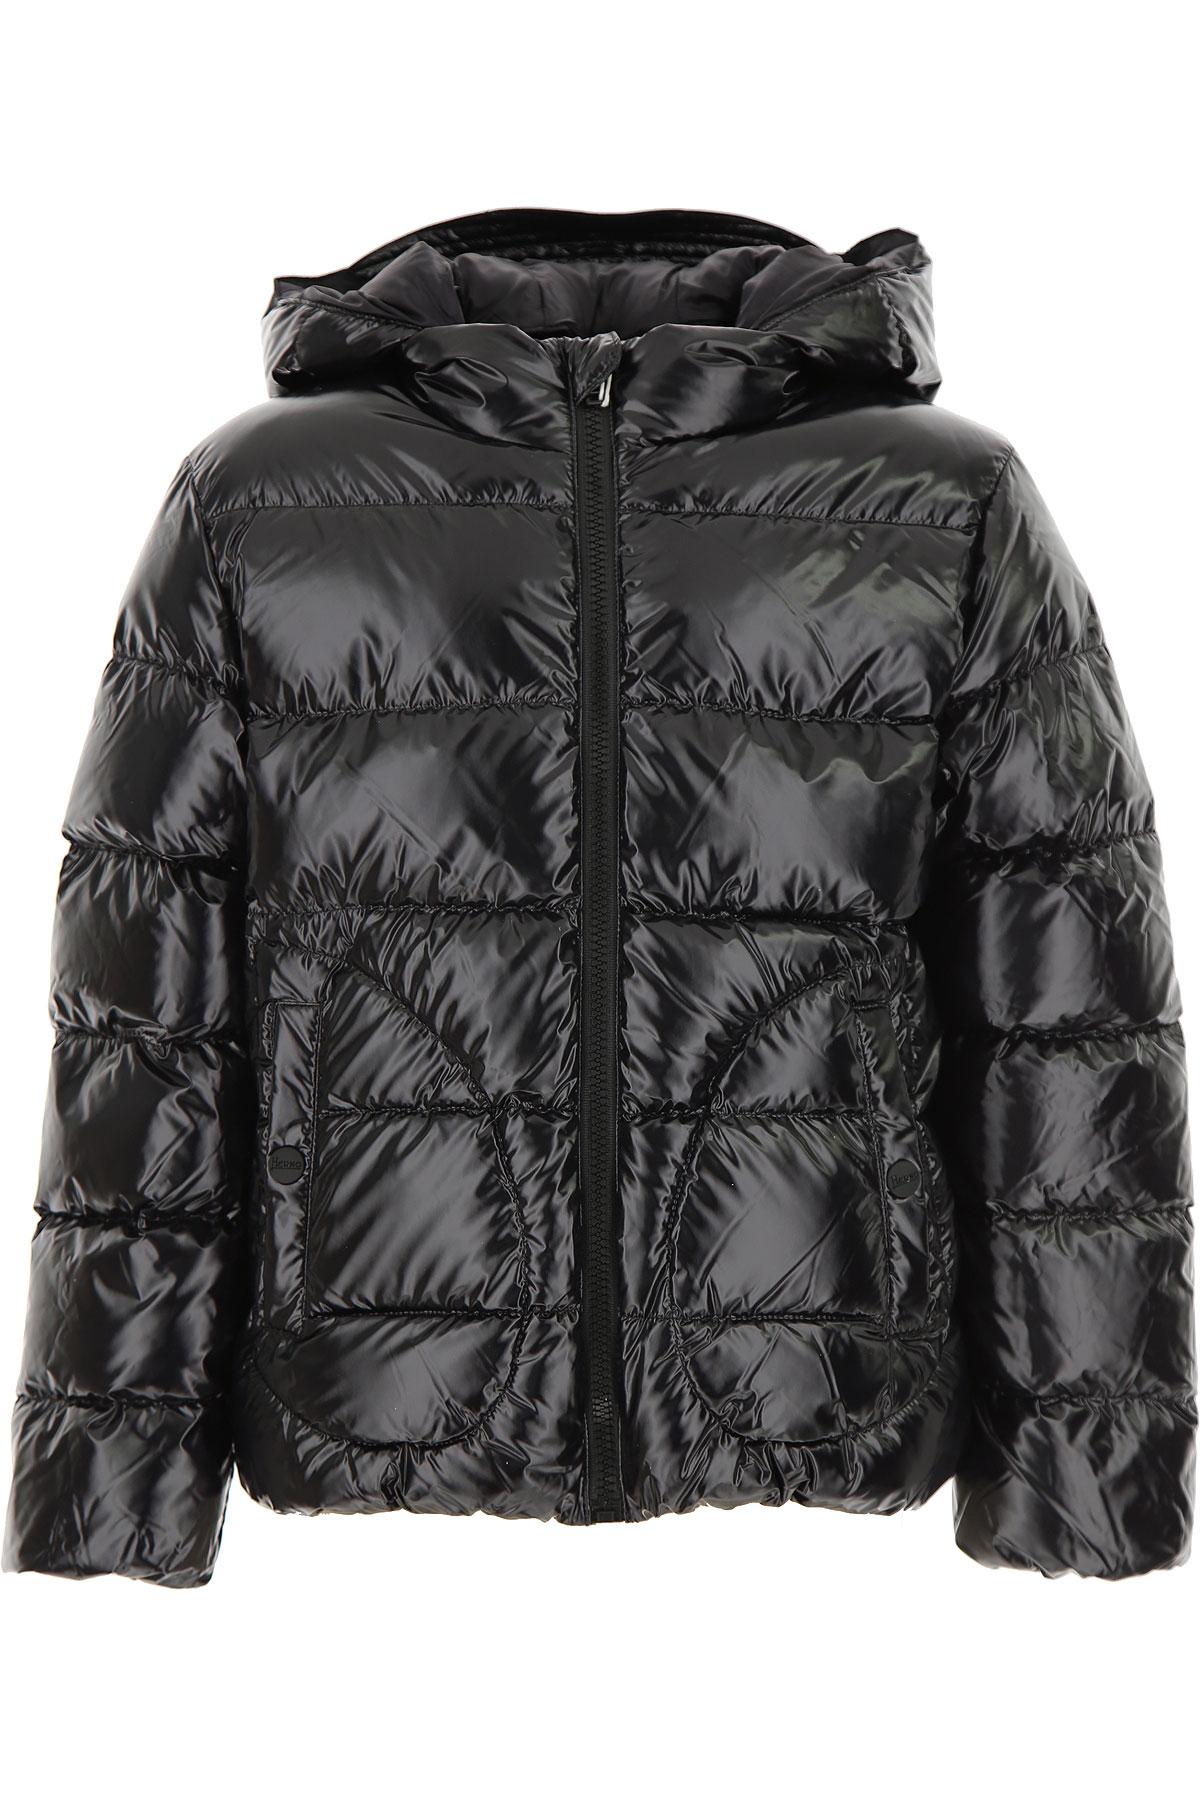 Herno Boys Down Jacket for Kids, Puffer Ski Jacket On Sale, Black, polyamide, 2019, 10Y 8Y